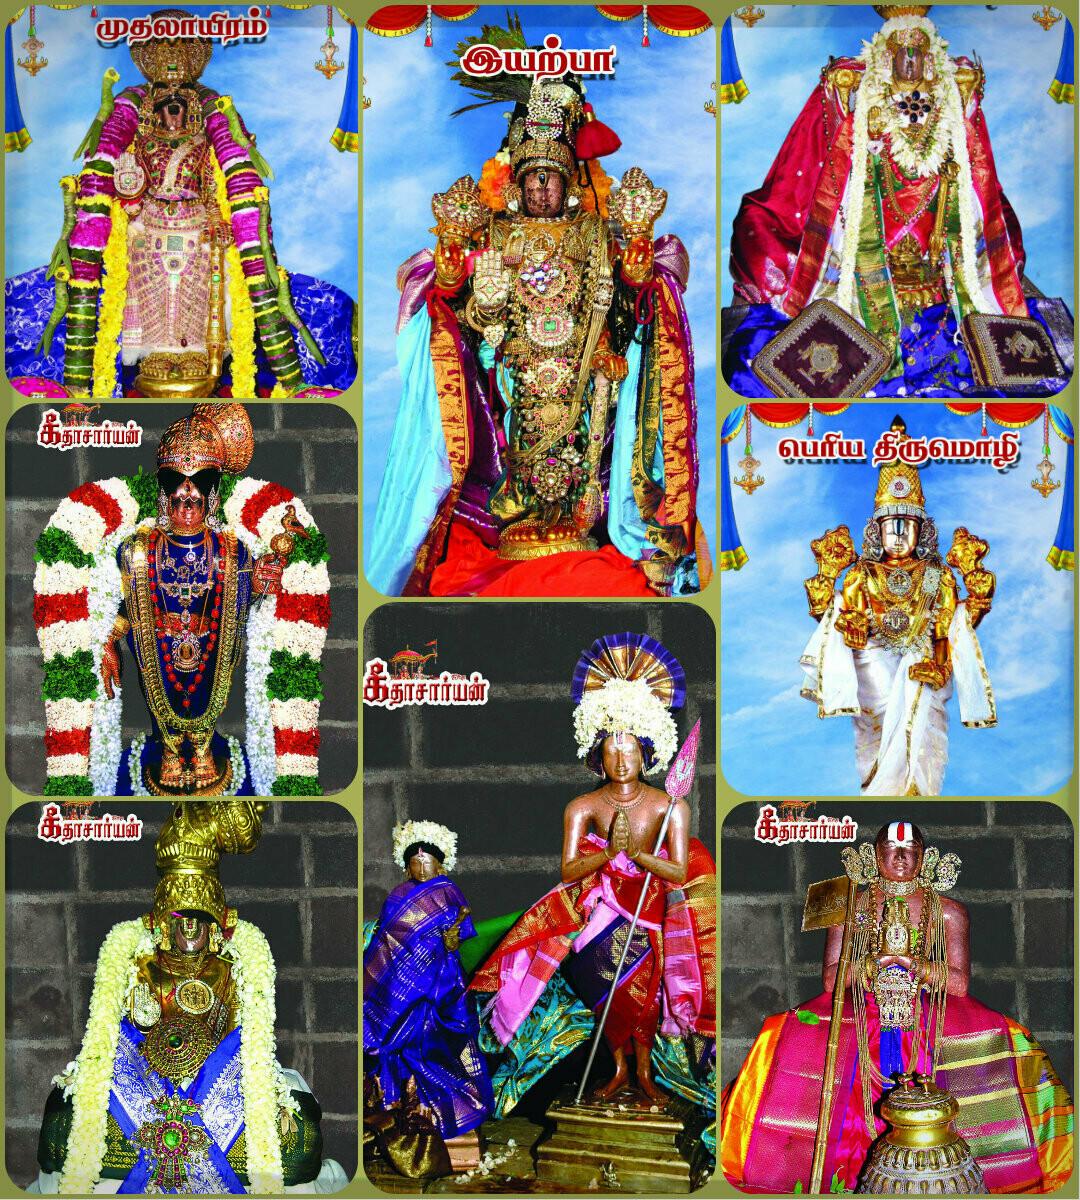 NDP pocket edition - 4 Vols Nalayira Divya Prabhandham  கையடக்கப் பிரதி நாலாயிர திவ்யப்ரபந்தம் மூலம்